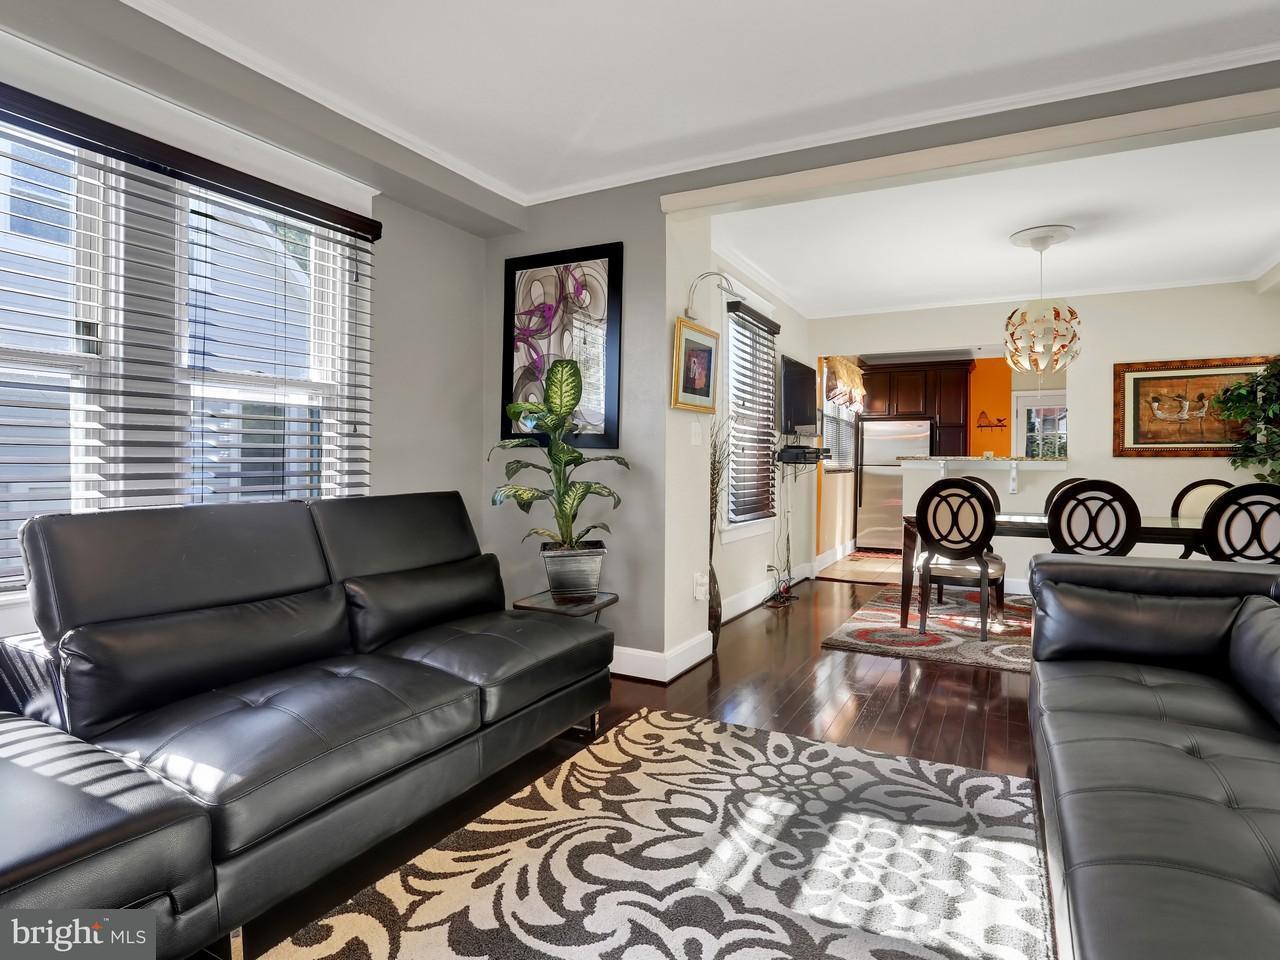 Single Family for Sale at 6004 Glenoak Ave Baltimore, Maryland 21214 United States